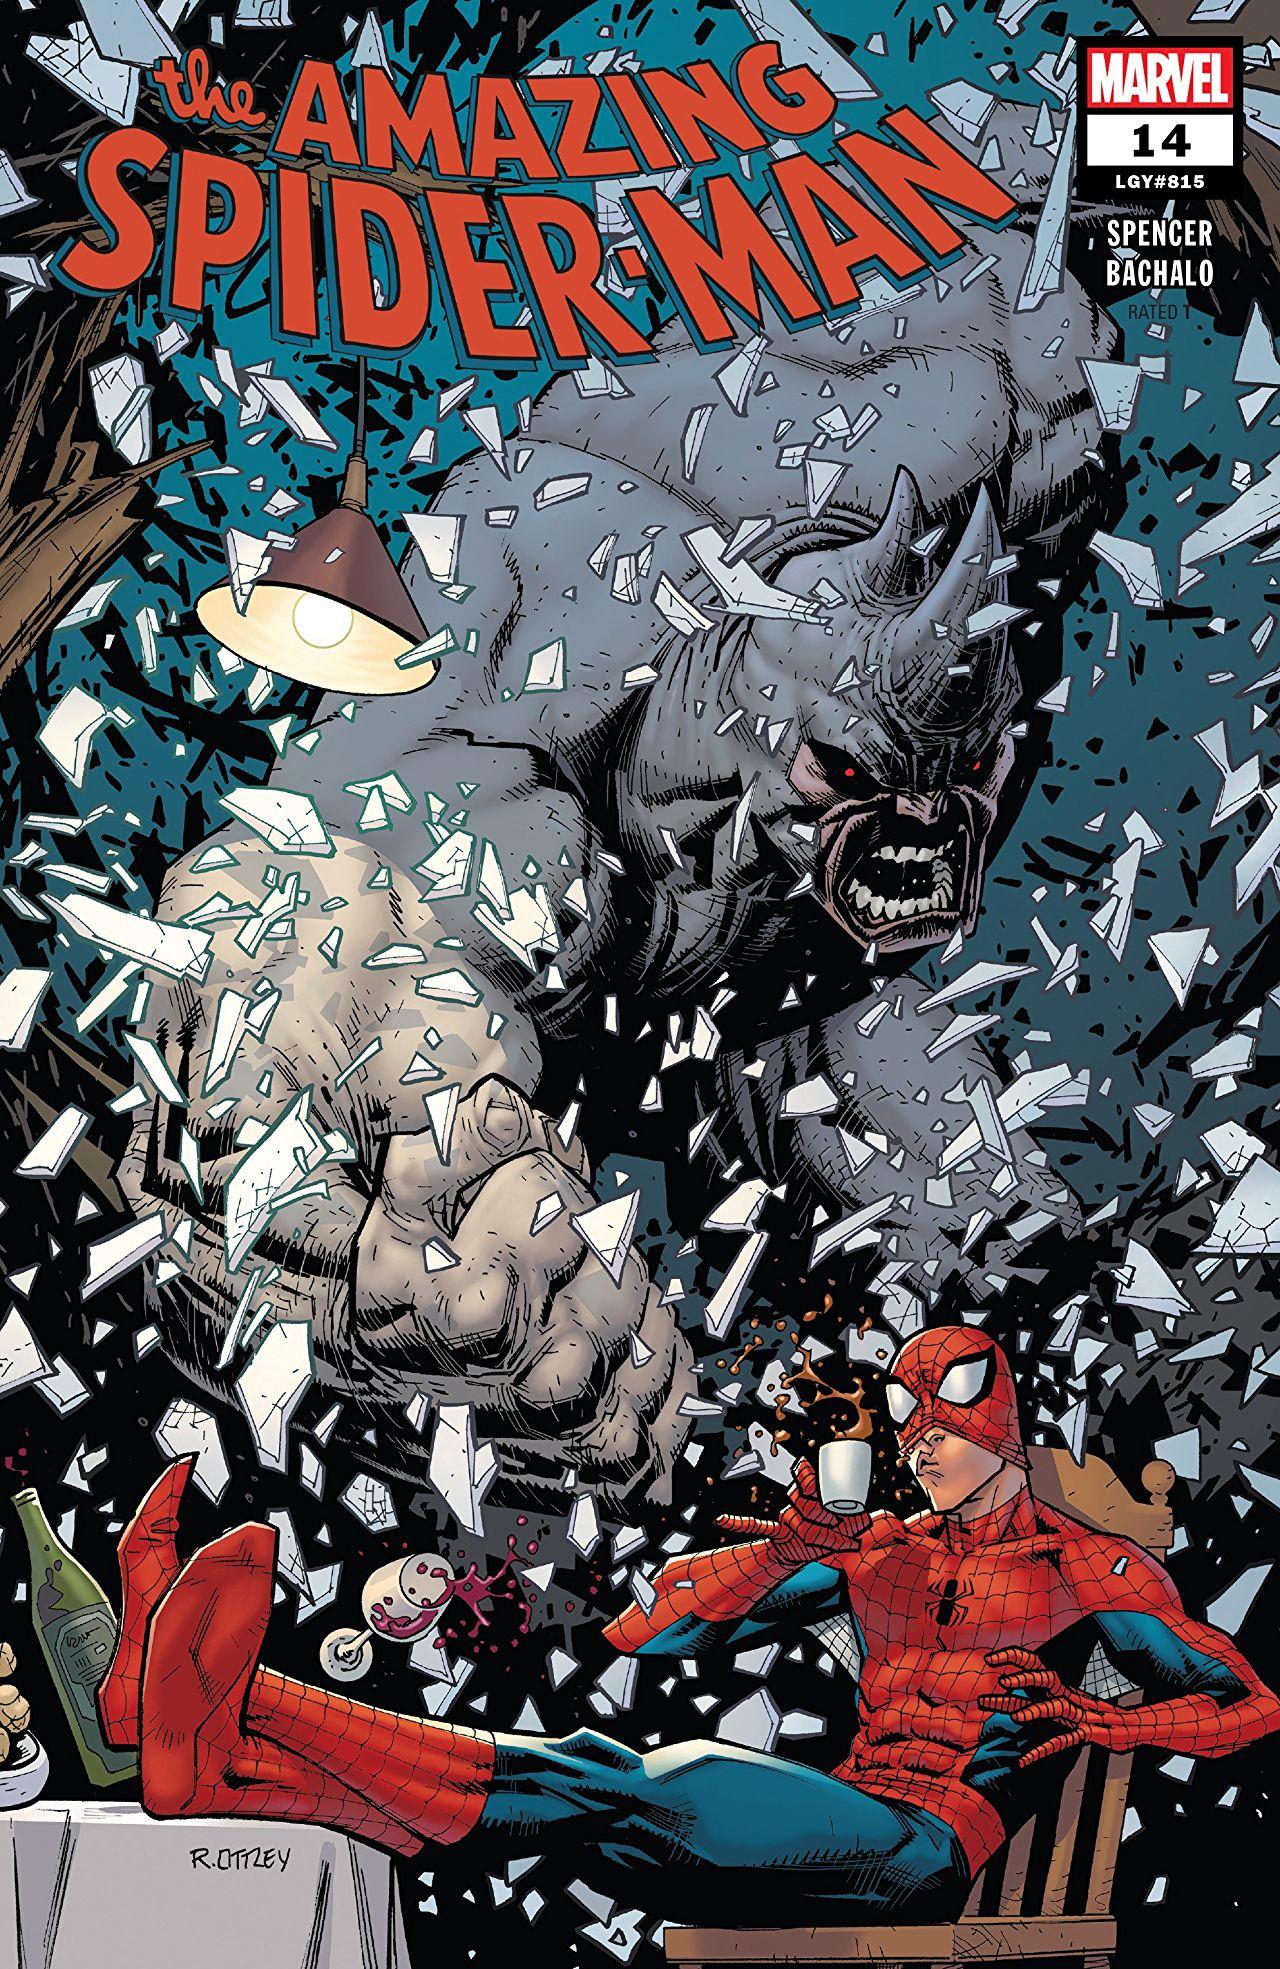 The Amazing Spider-Man 14